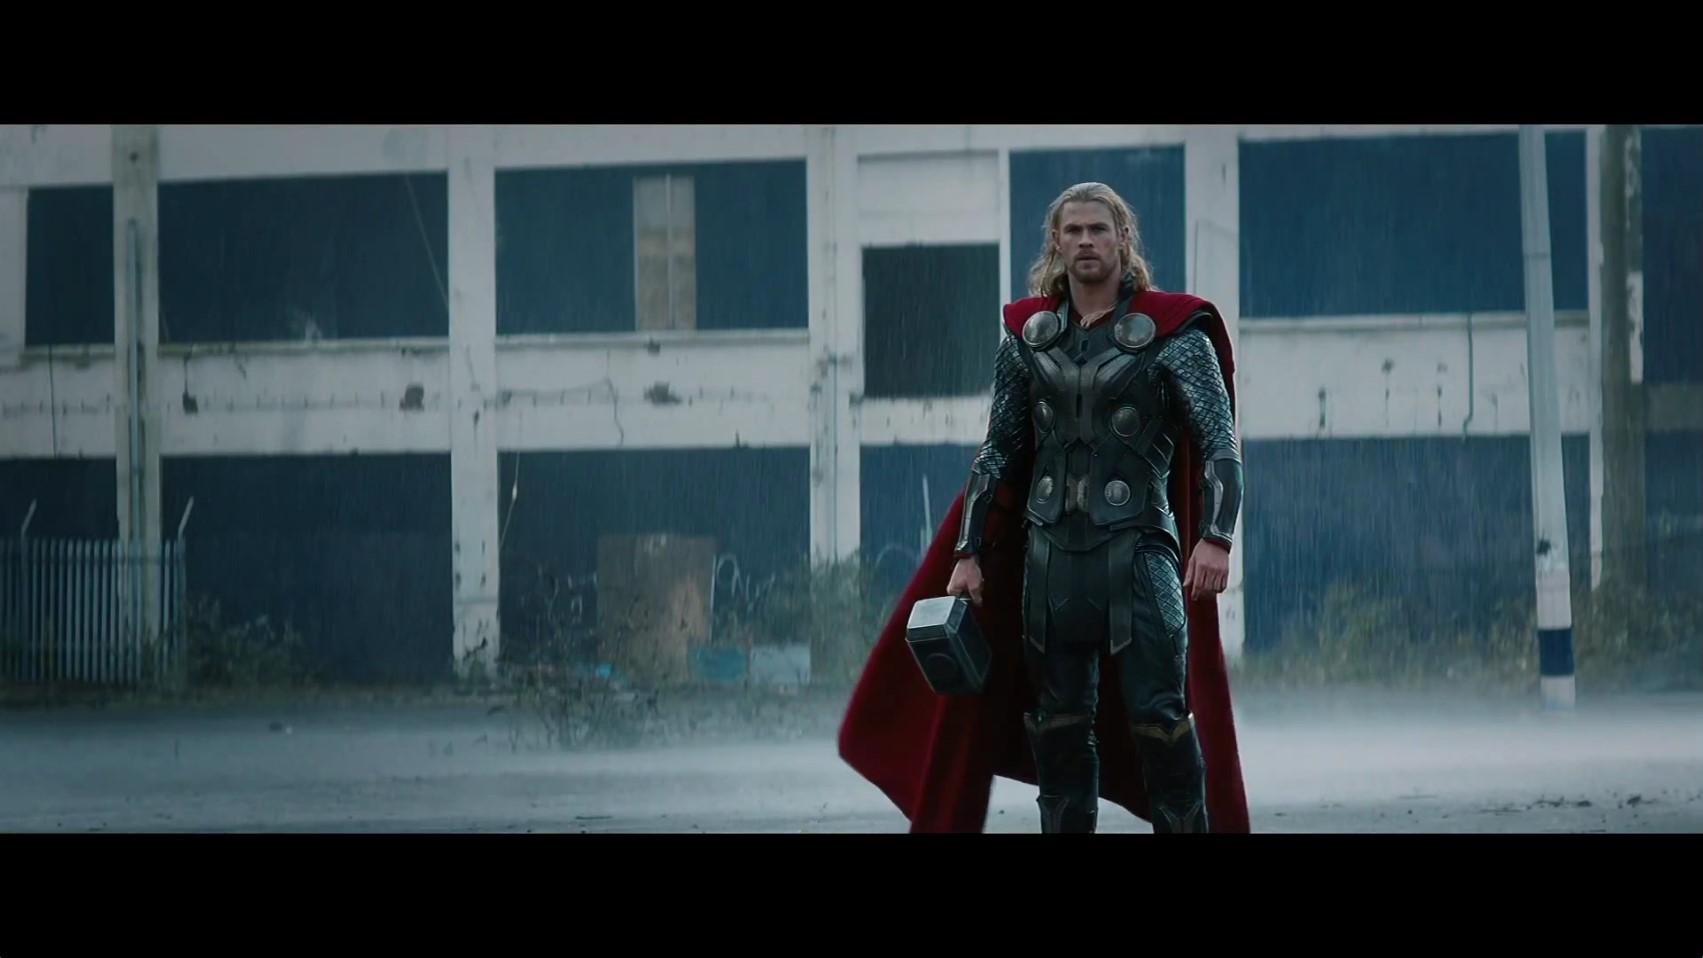 Thor: The Dark wold